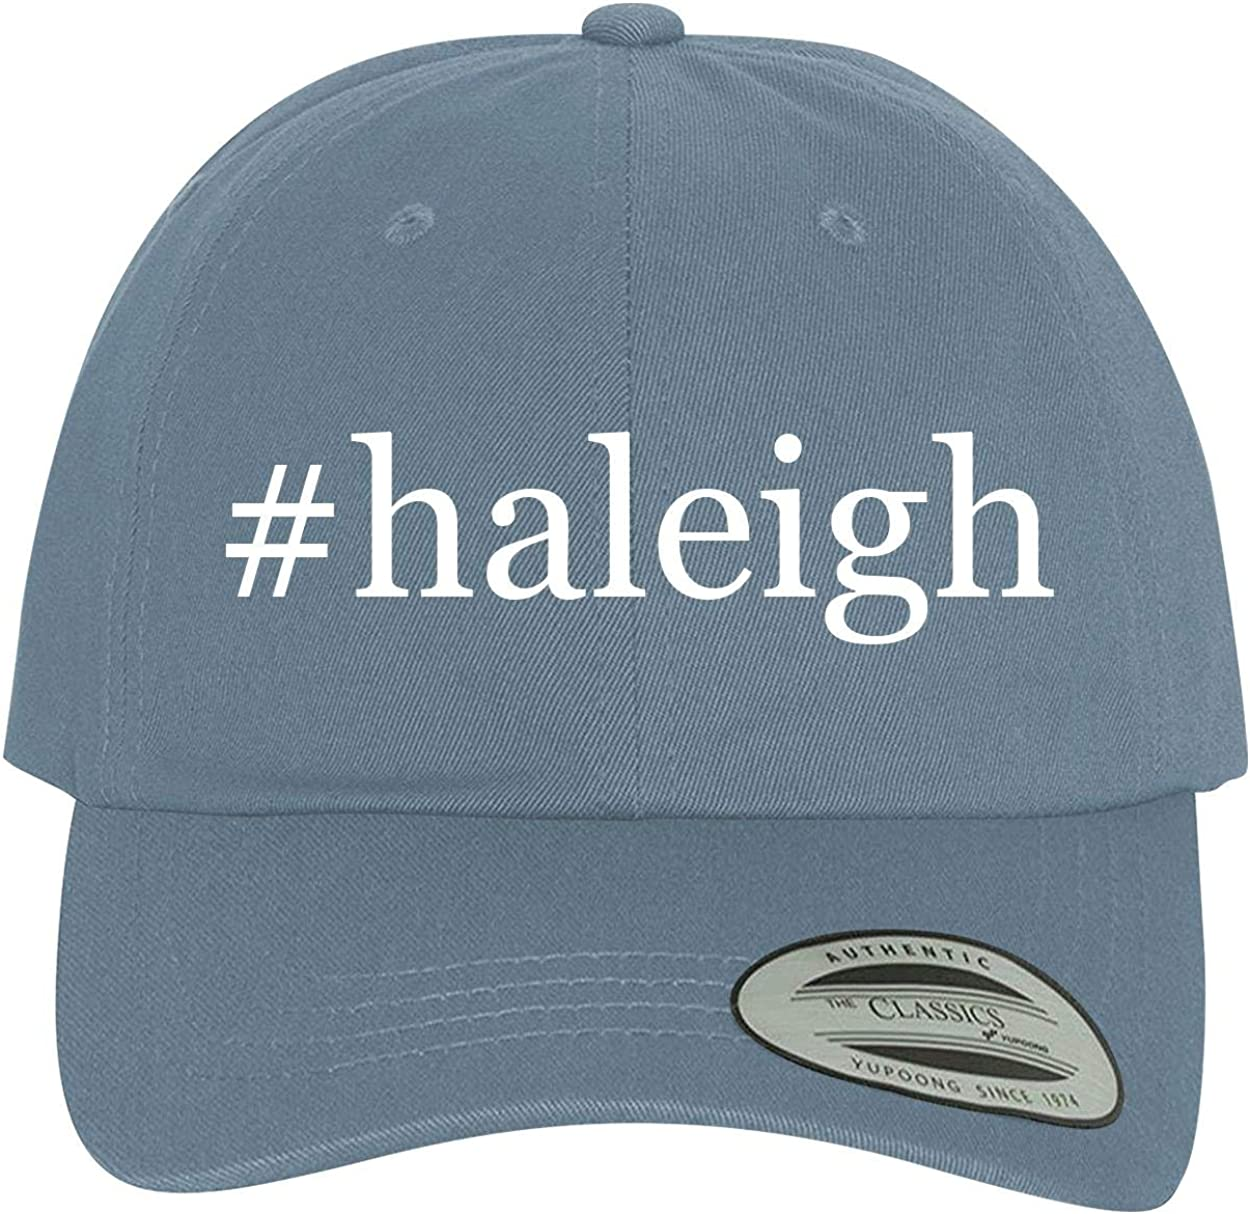 Comfortable Dad Hat Baseball Cap BH Cool Designs #Haleigh